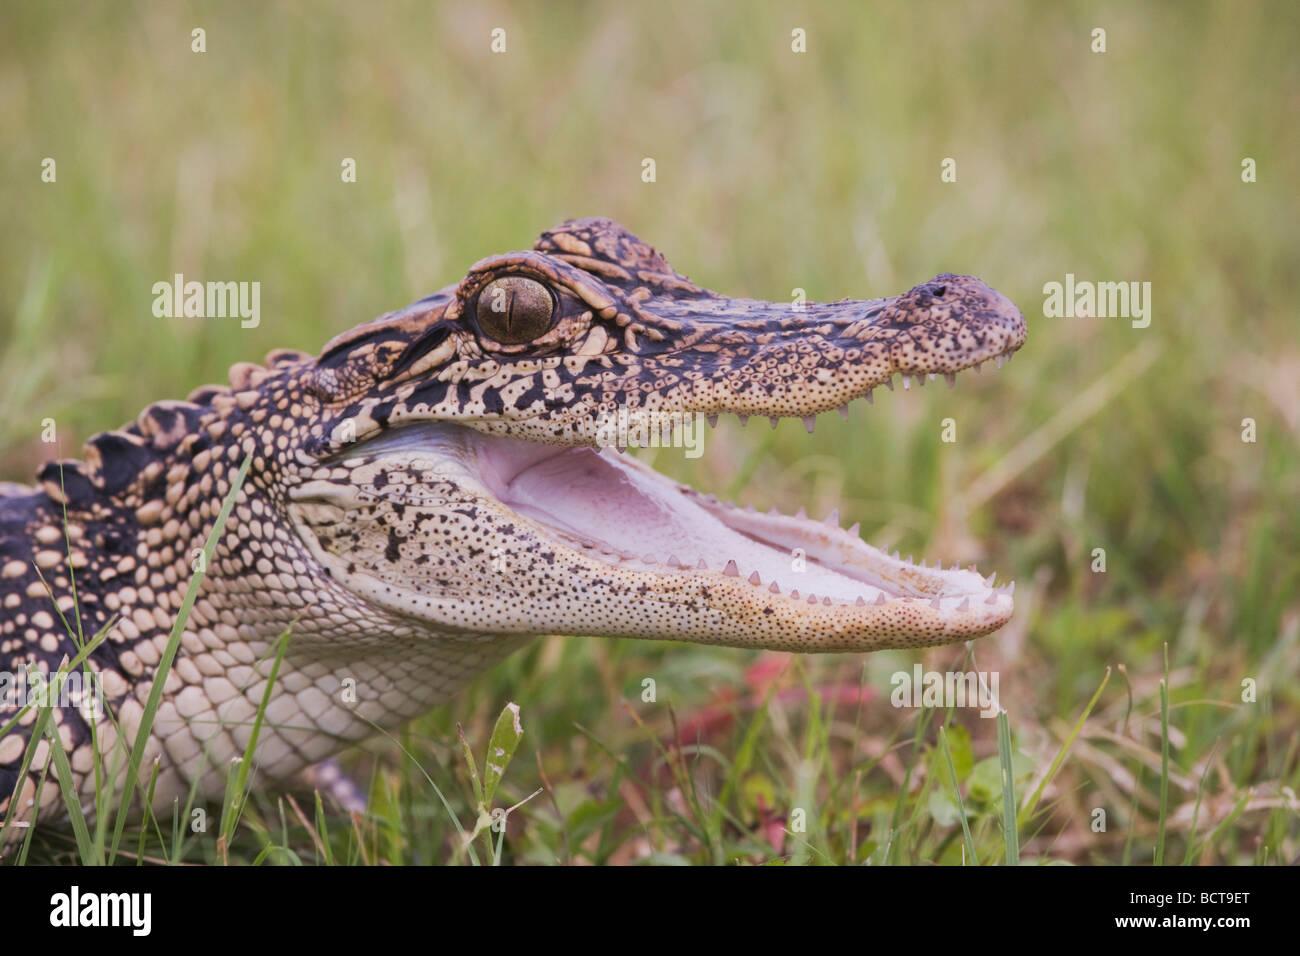 American Alligator Alligator mississipiensis Sinton Corpus Christi Coastal Bend Texas USA - Stock Image